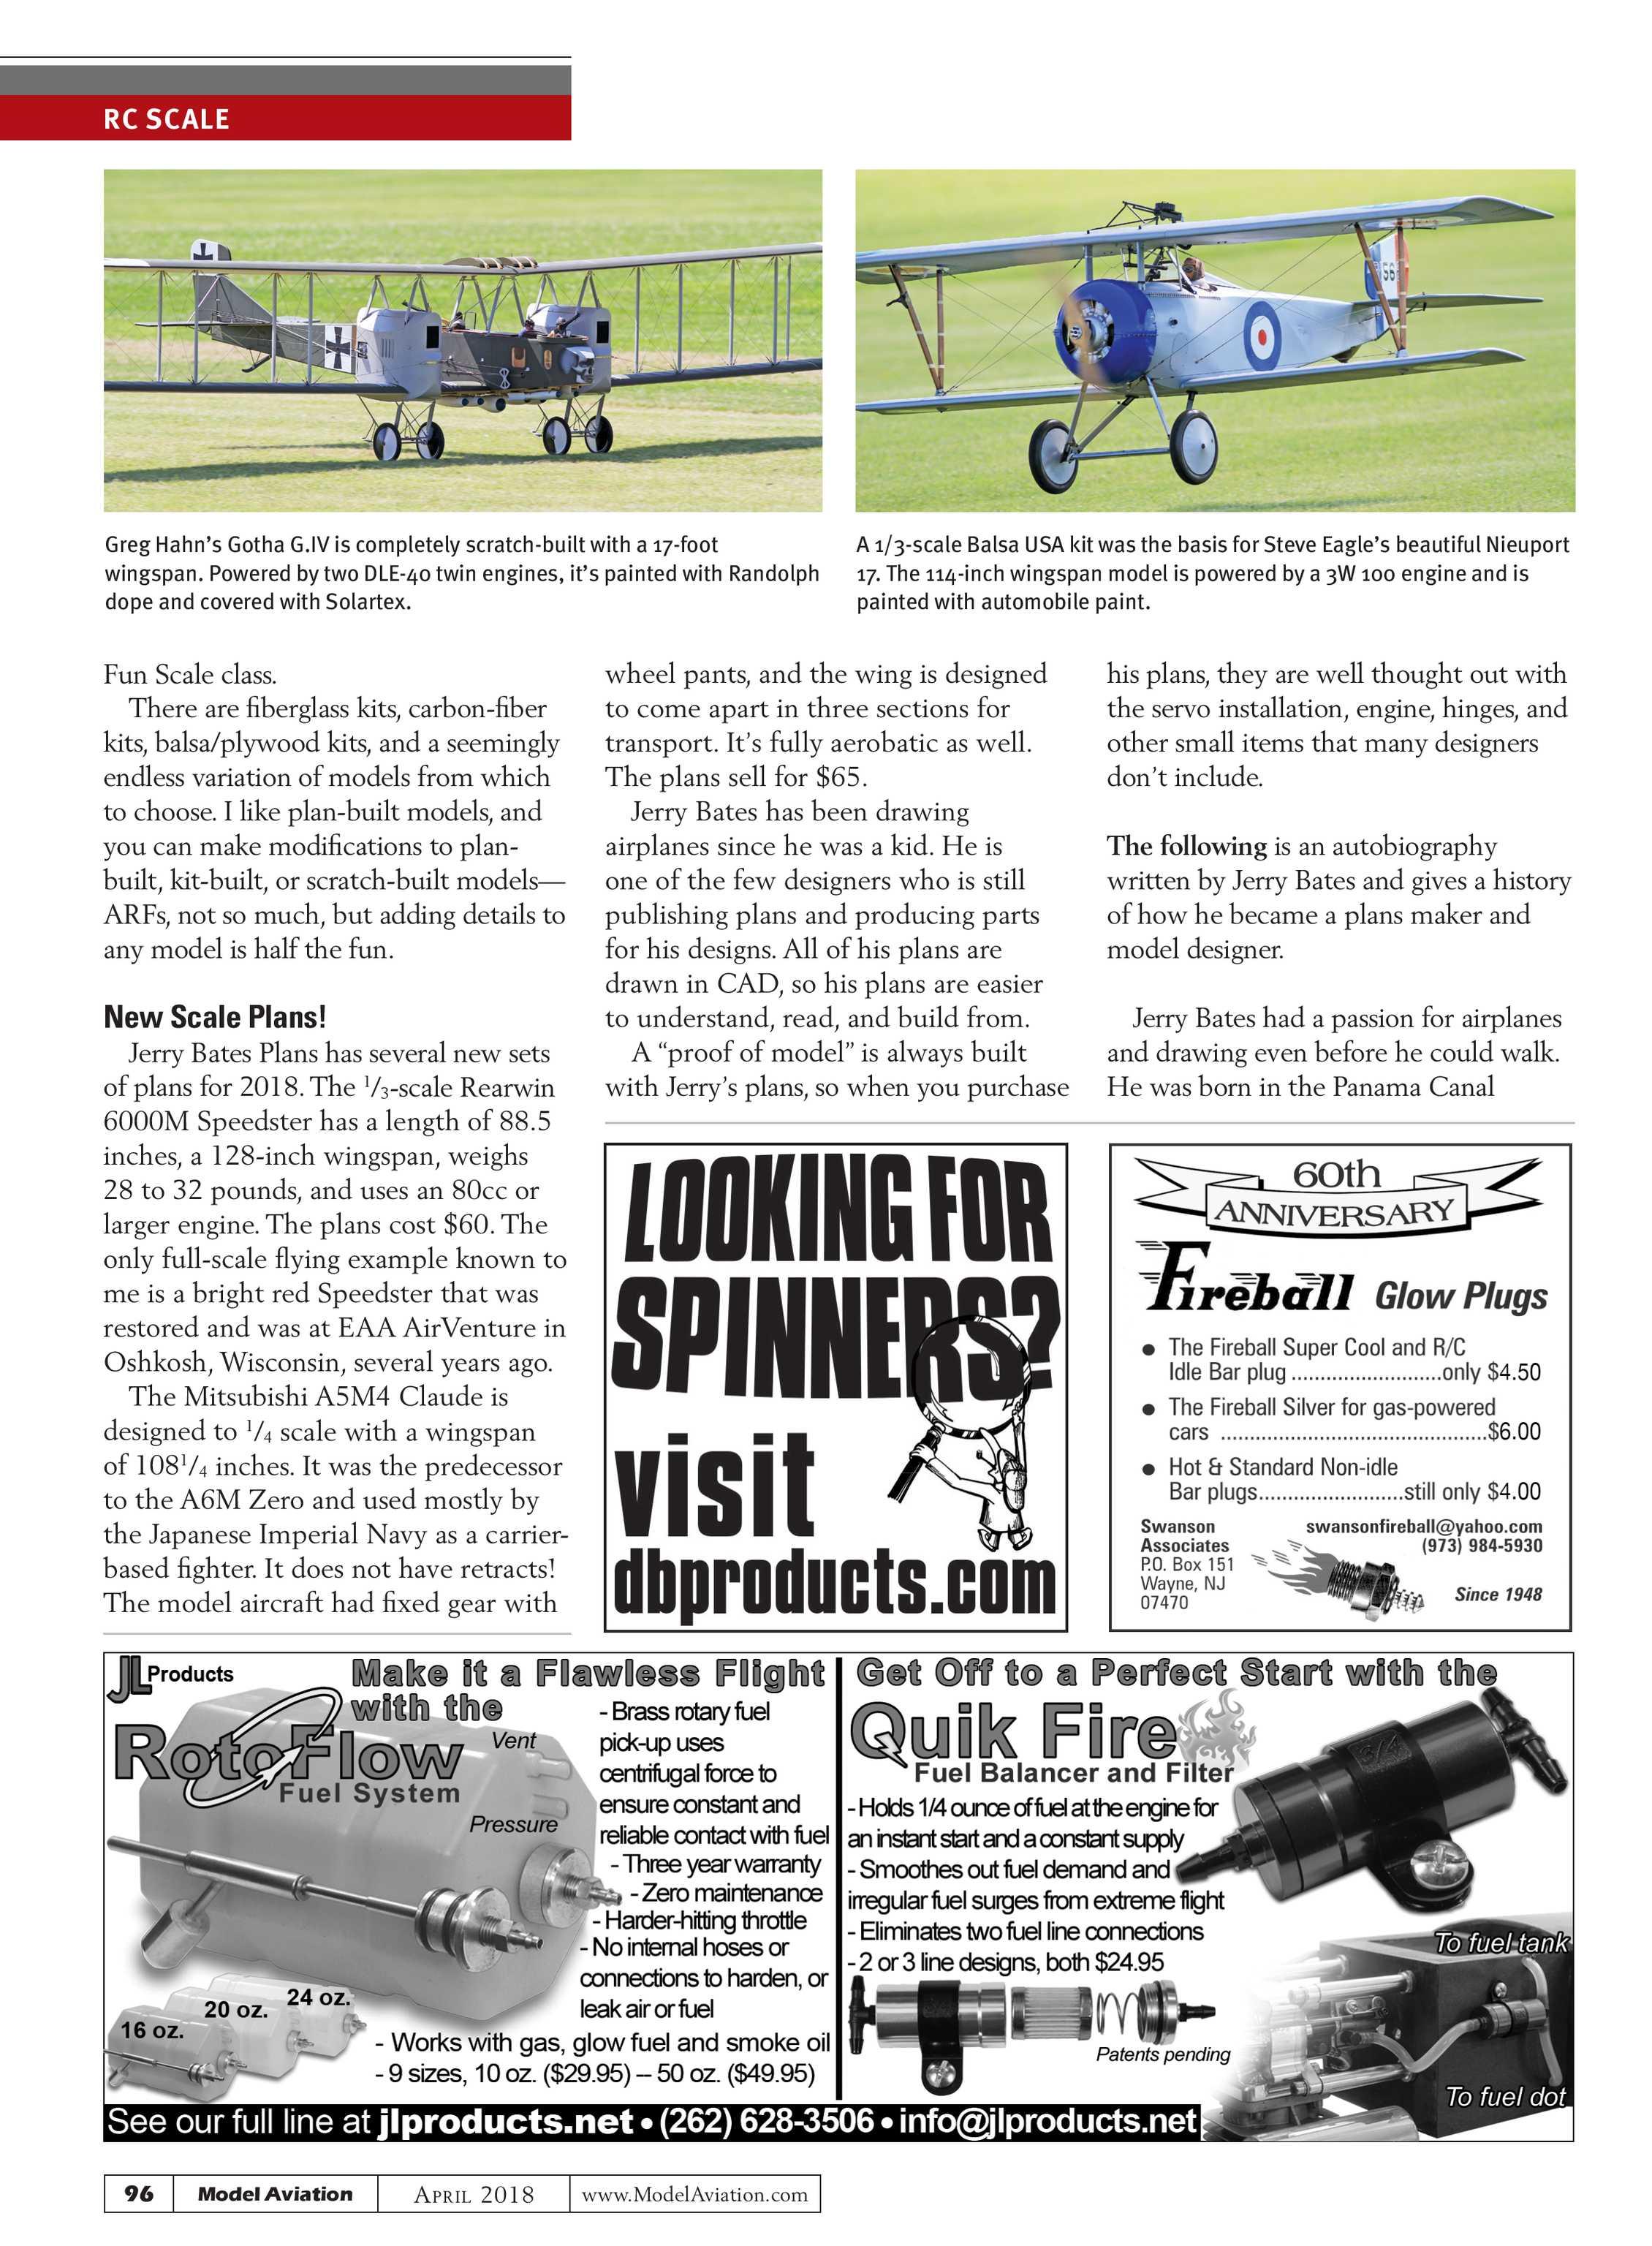 Model Aviation - April 2018 - page 95